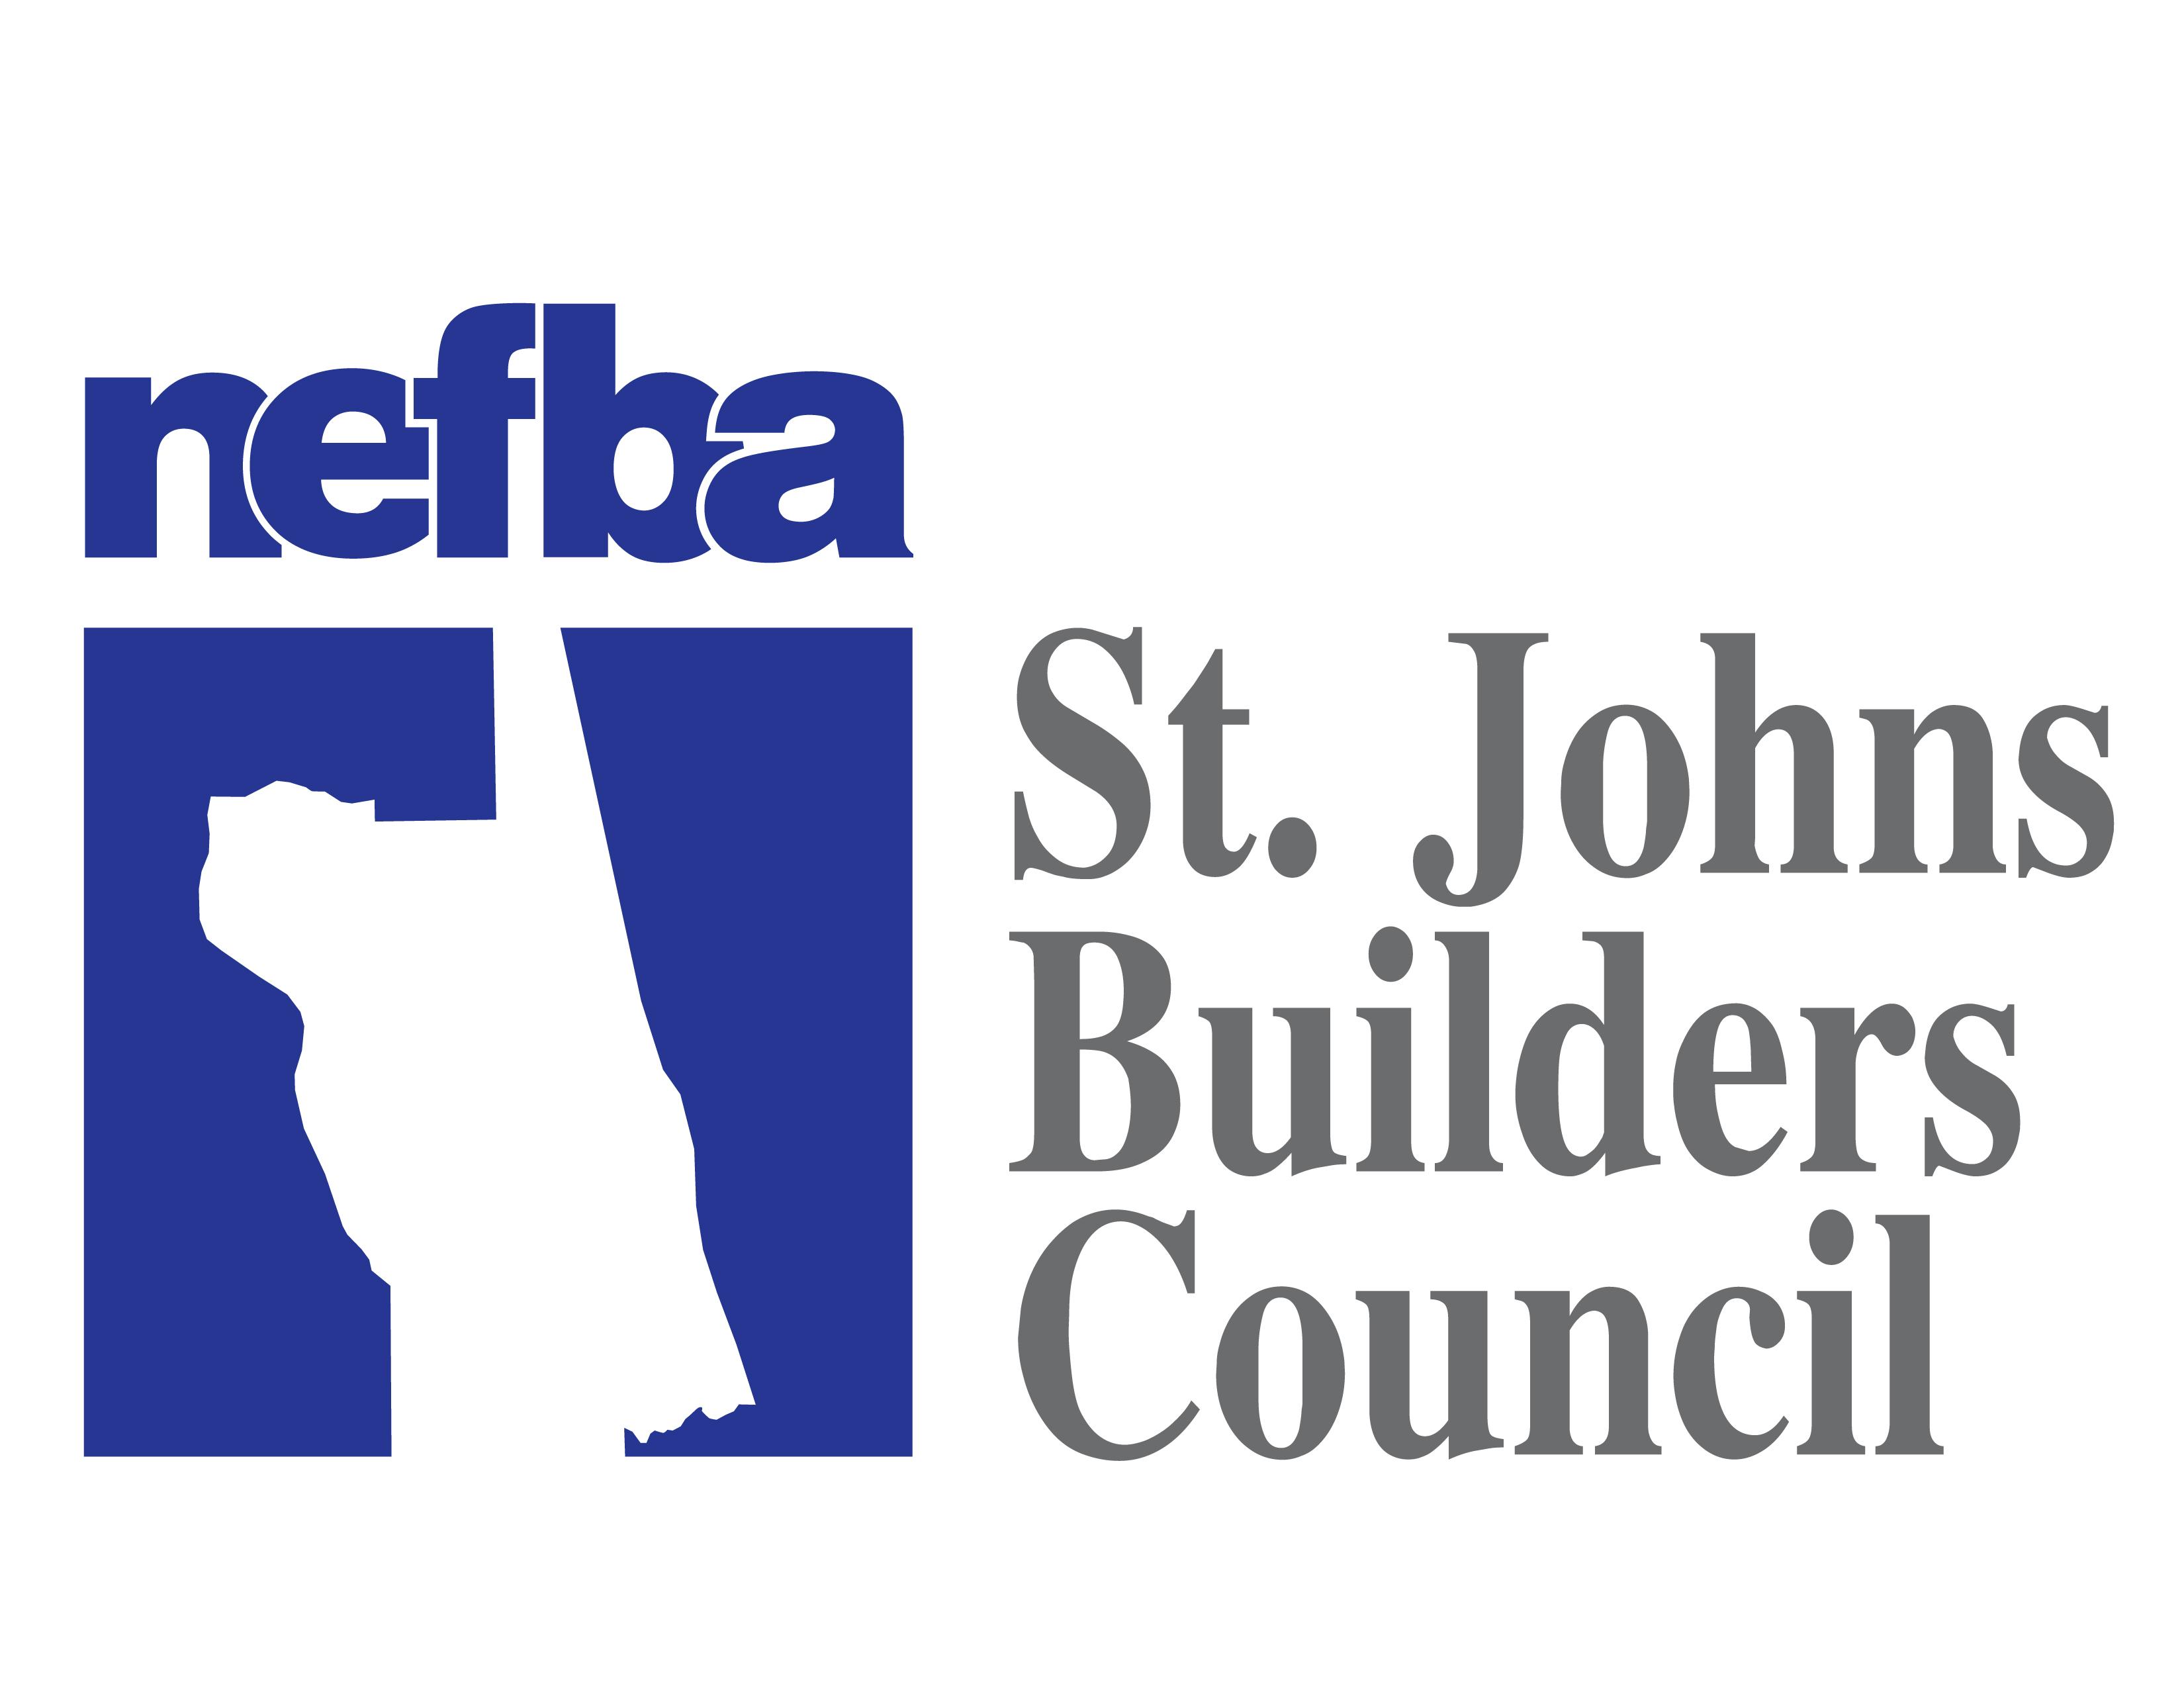 NEFBA St Johns Builders Council